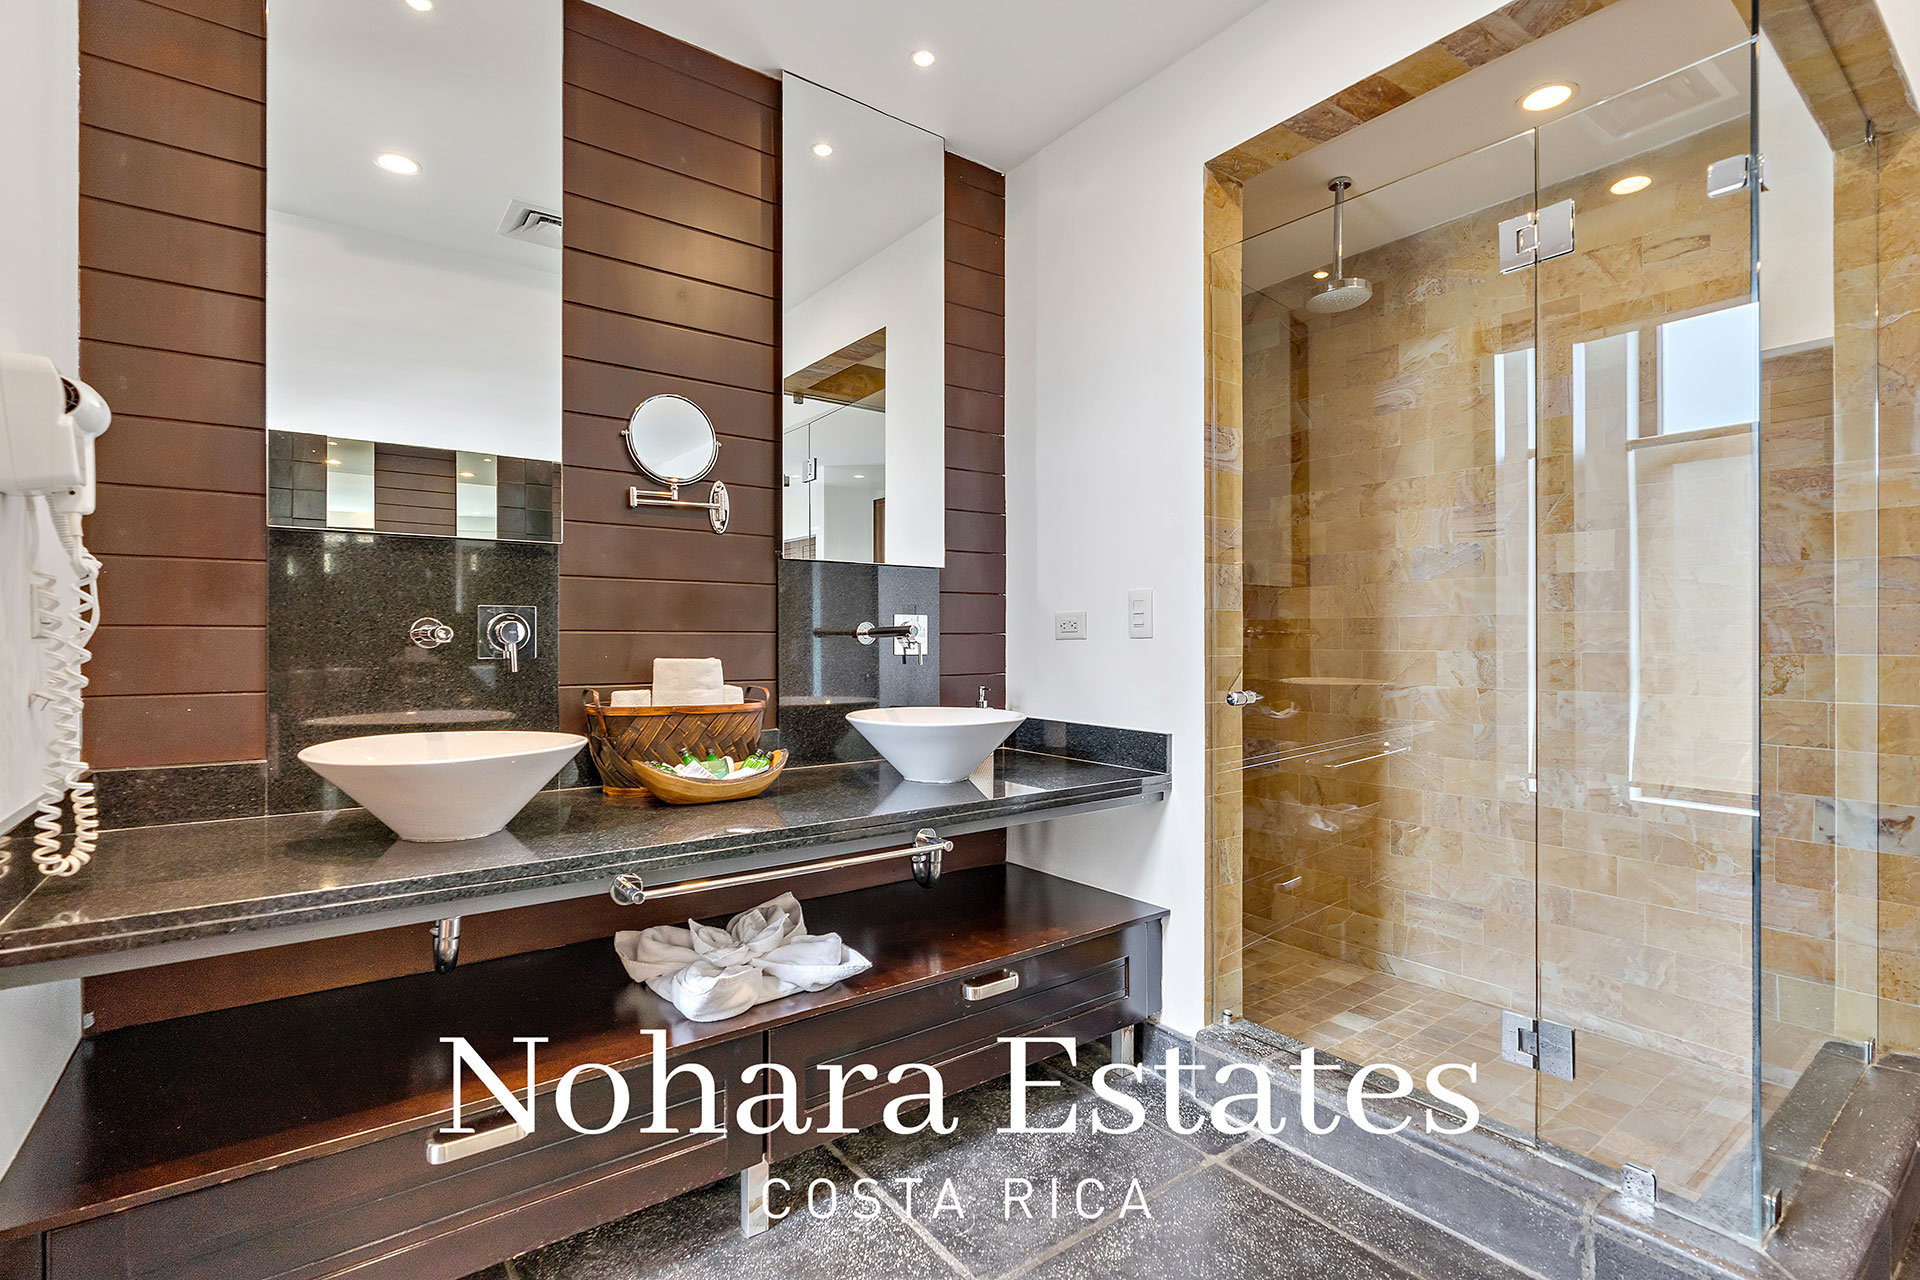 Nohara Estates Costa Rica 122 Apartment Quepos Los Altos 12